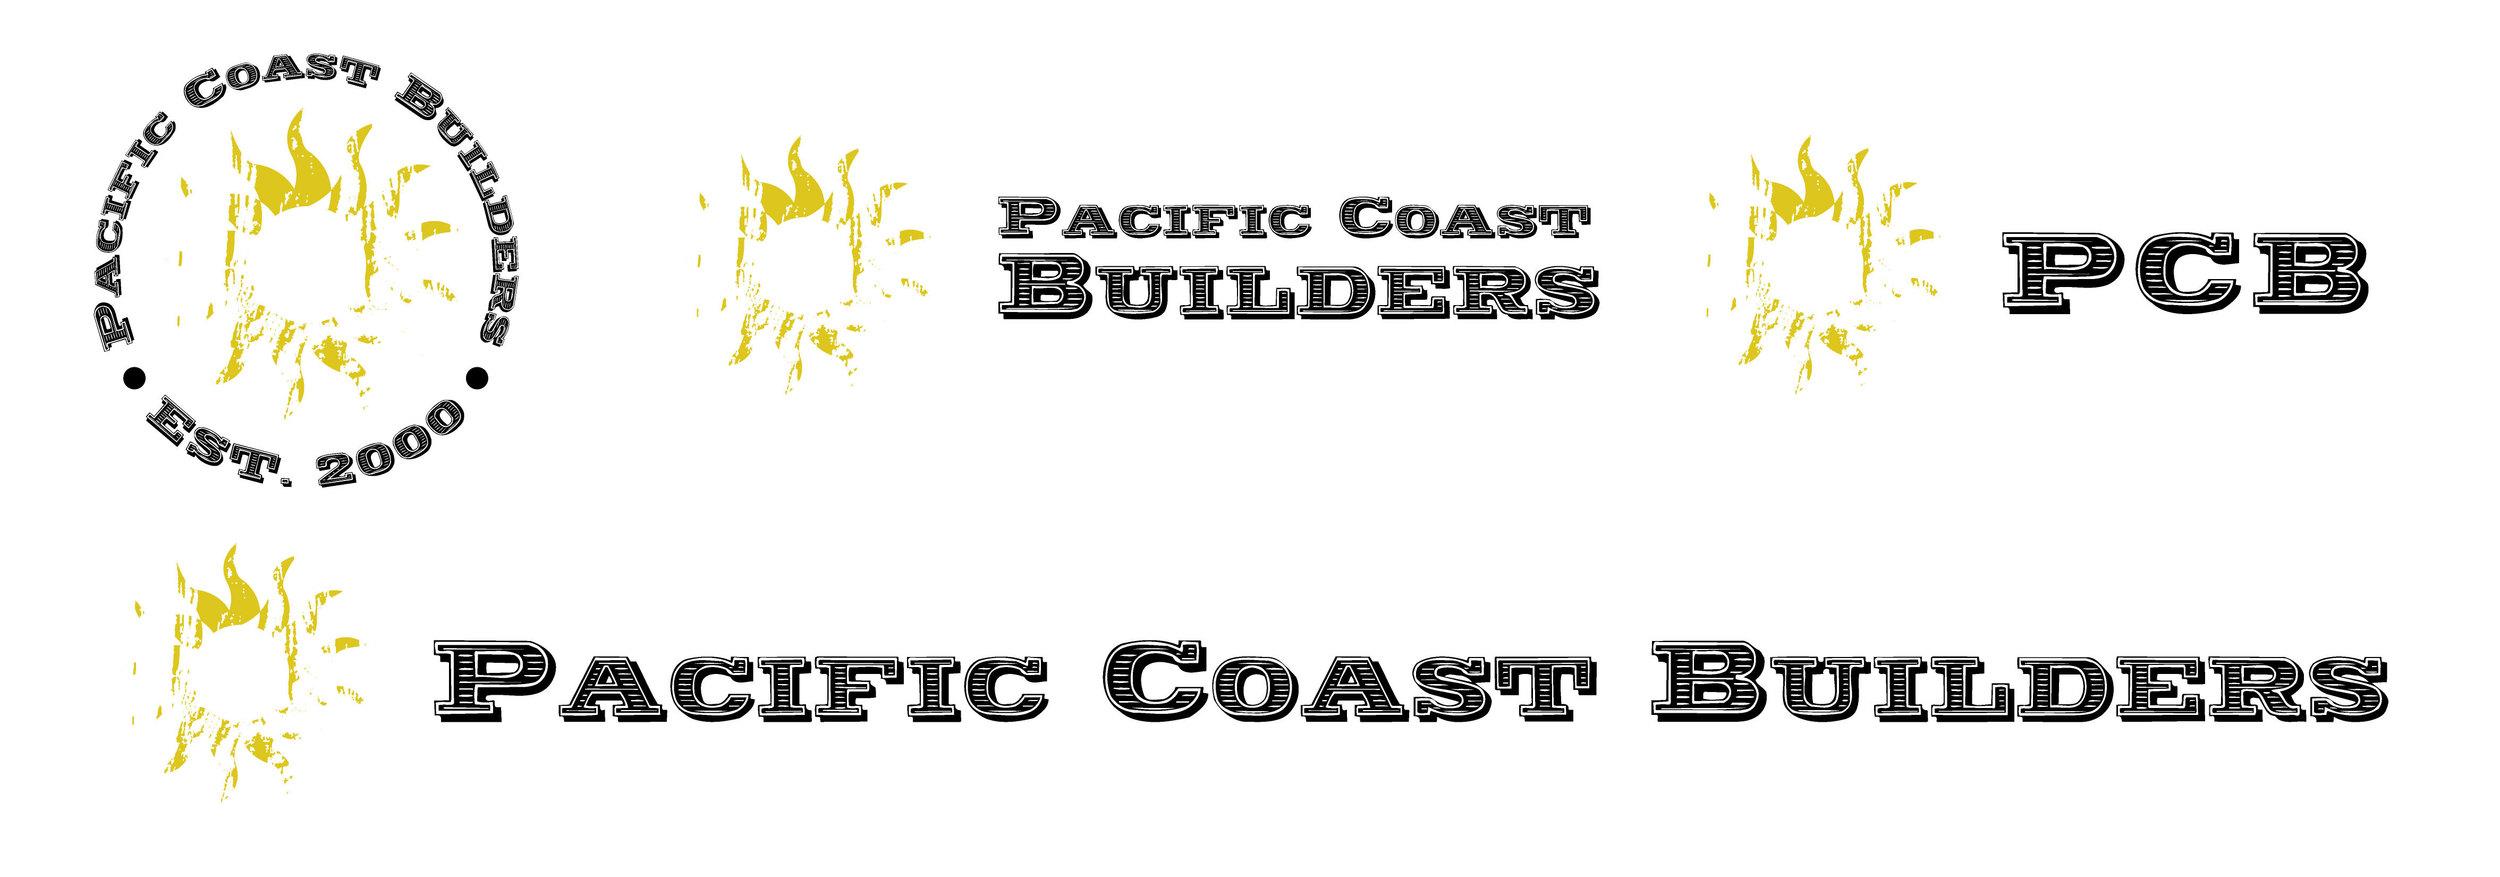 Pacific Coast Builders Logo